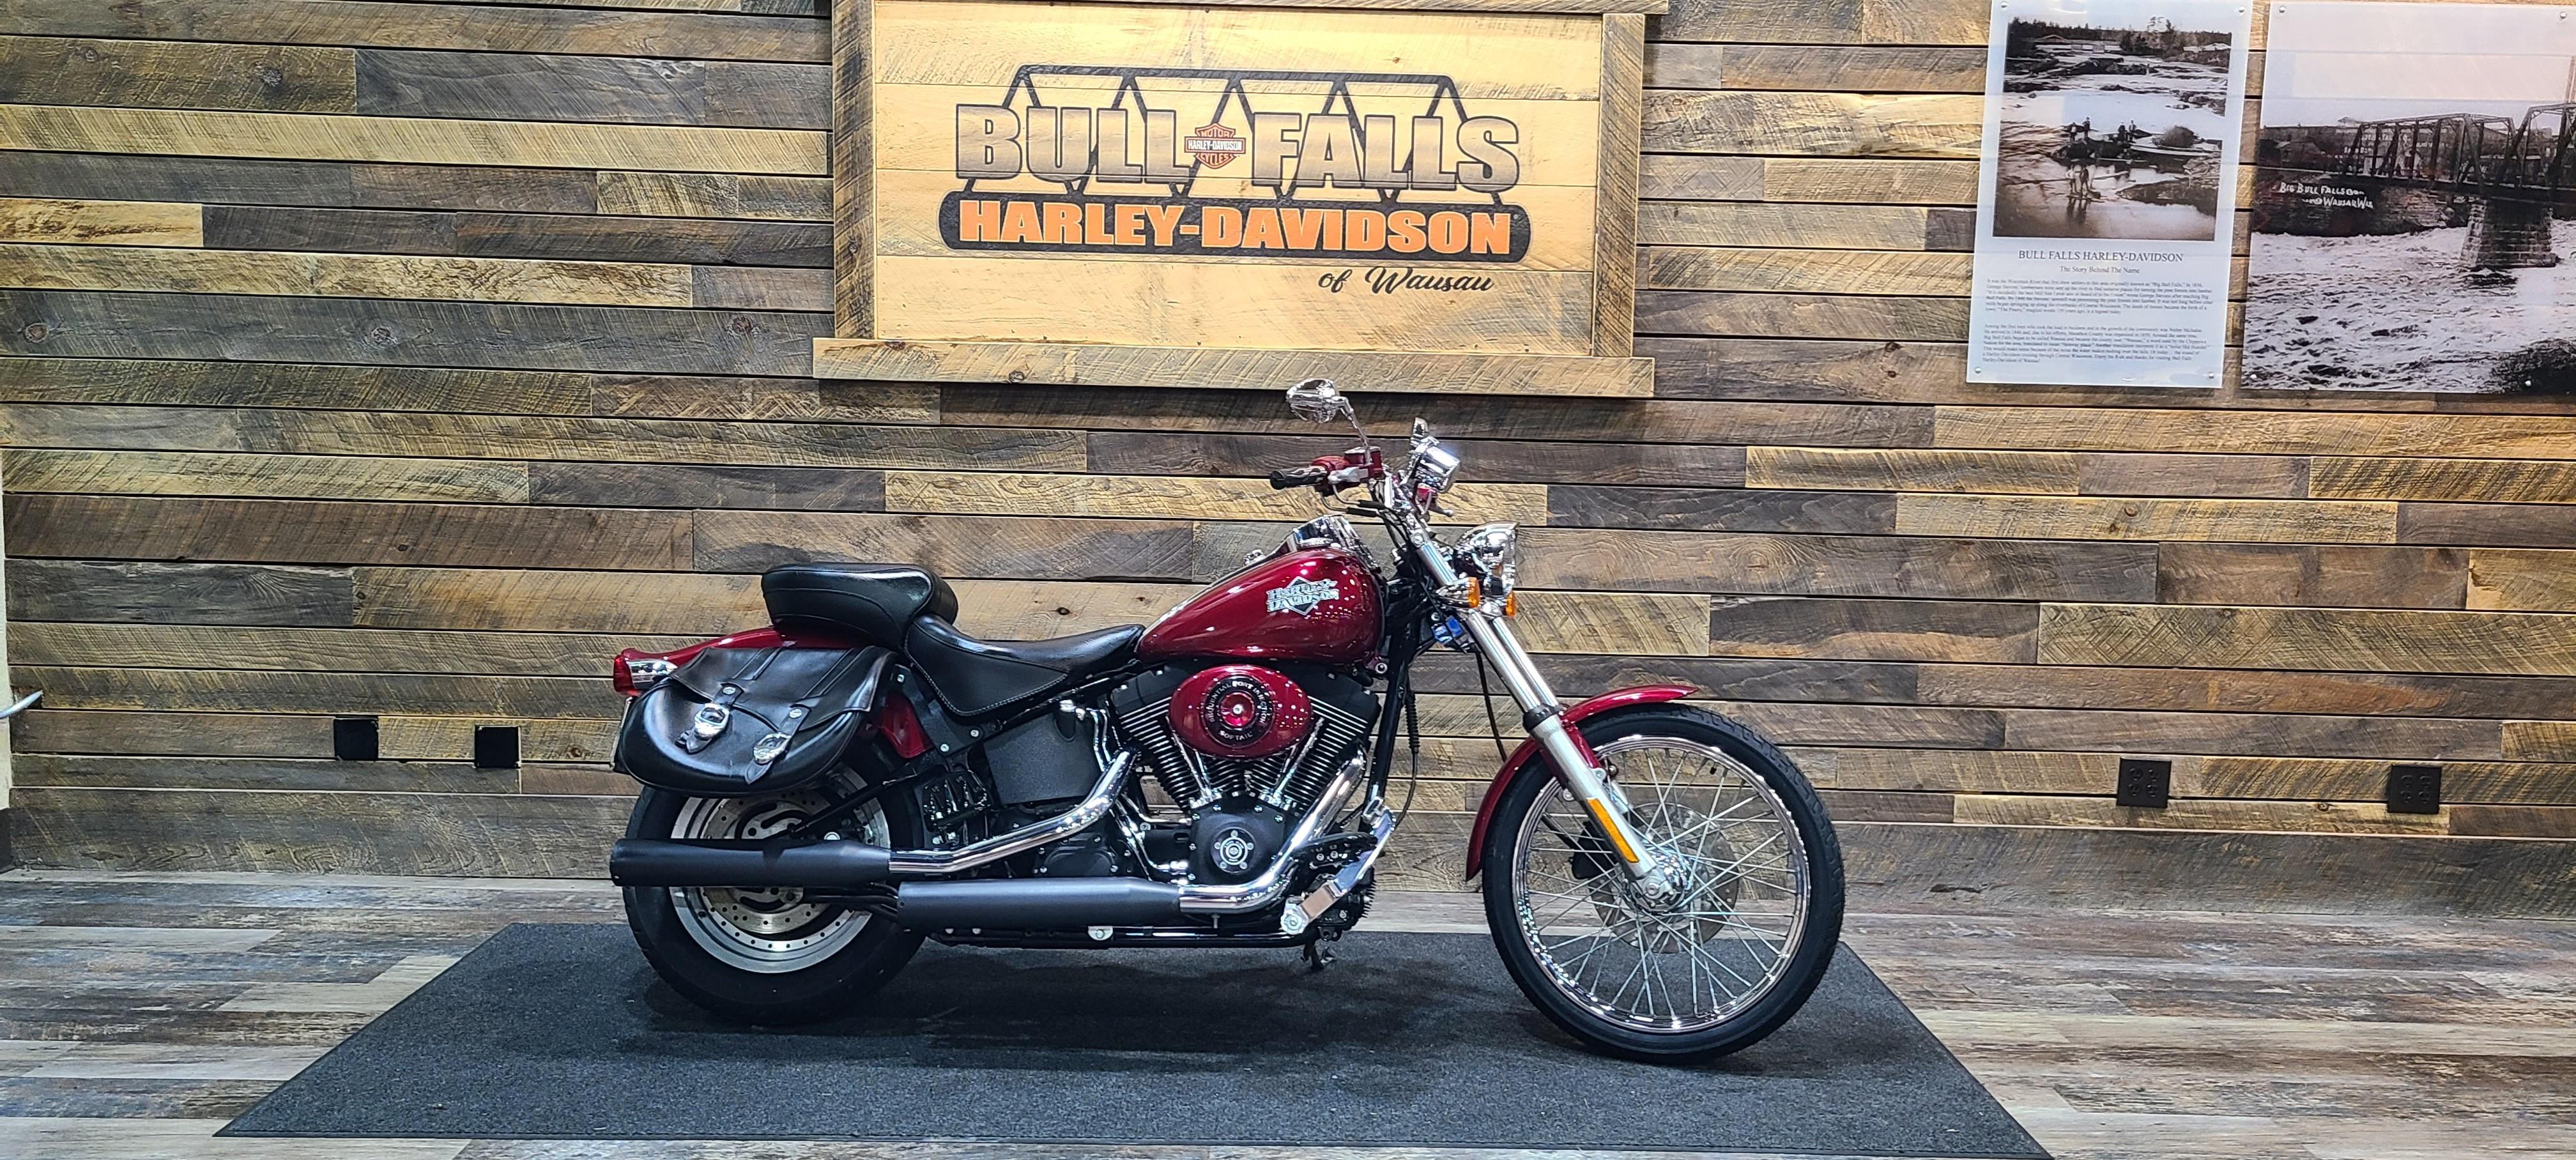 2004 Harley-Davidson Softail Night Train at Bull Falls Harley-Davidson